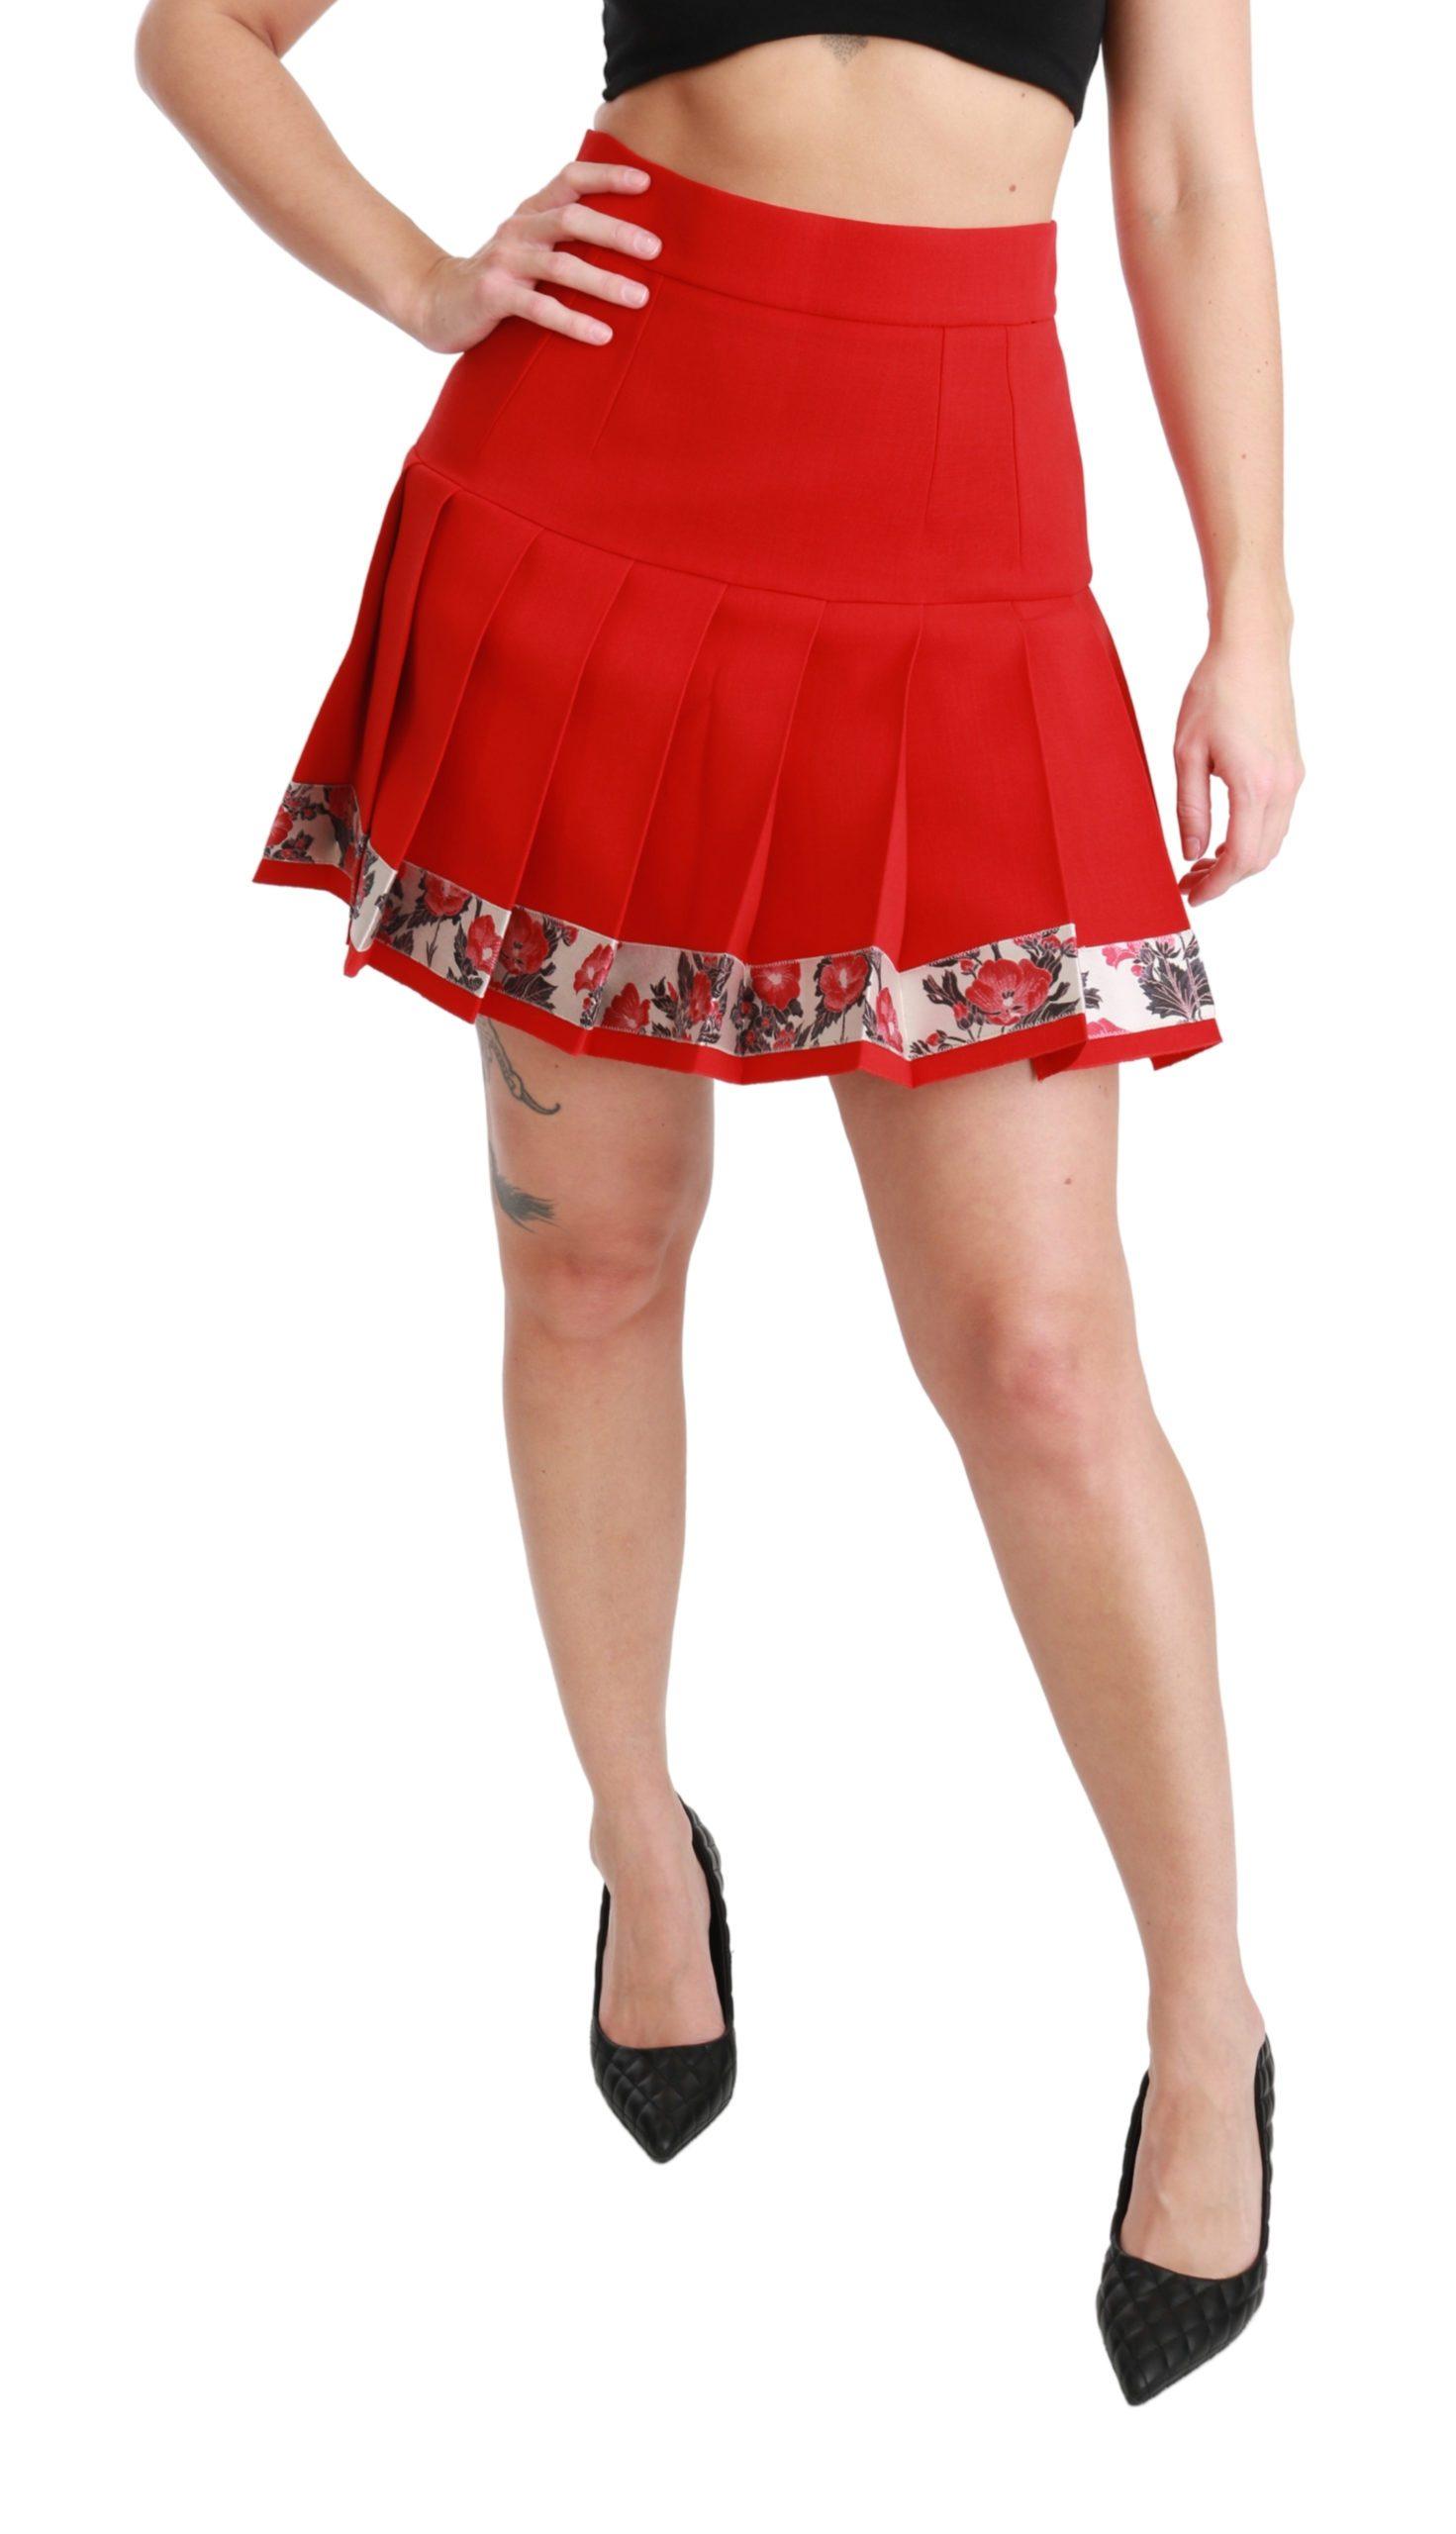 Dolce & Gabbana Women's Wool High Waist Pleated Floral Skirt Red SKI1436 - IT42 M